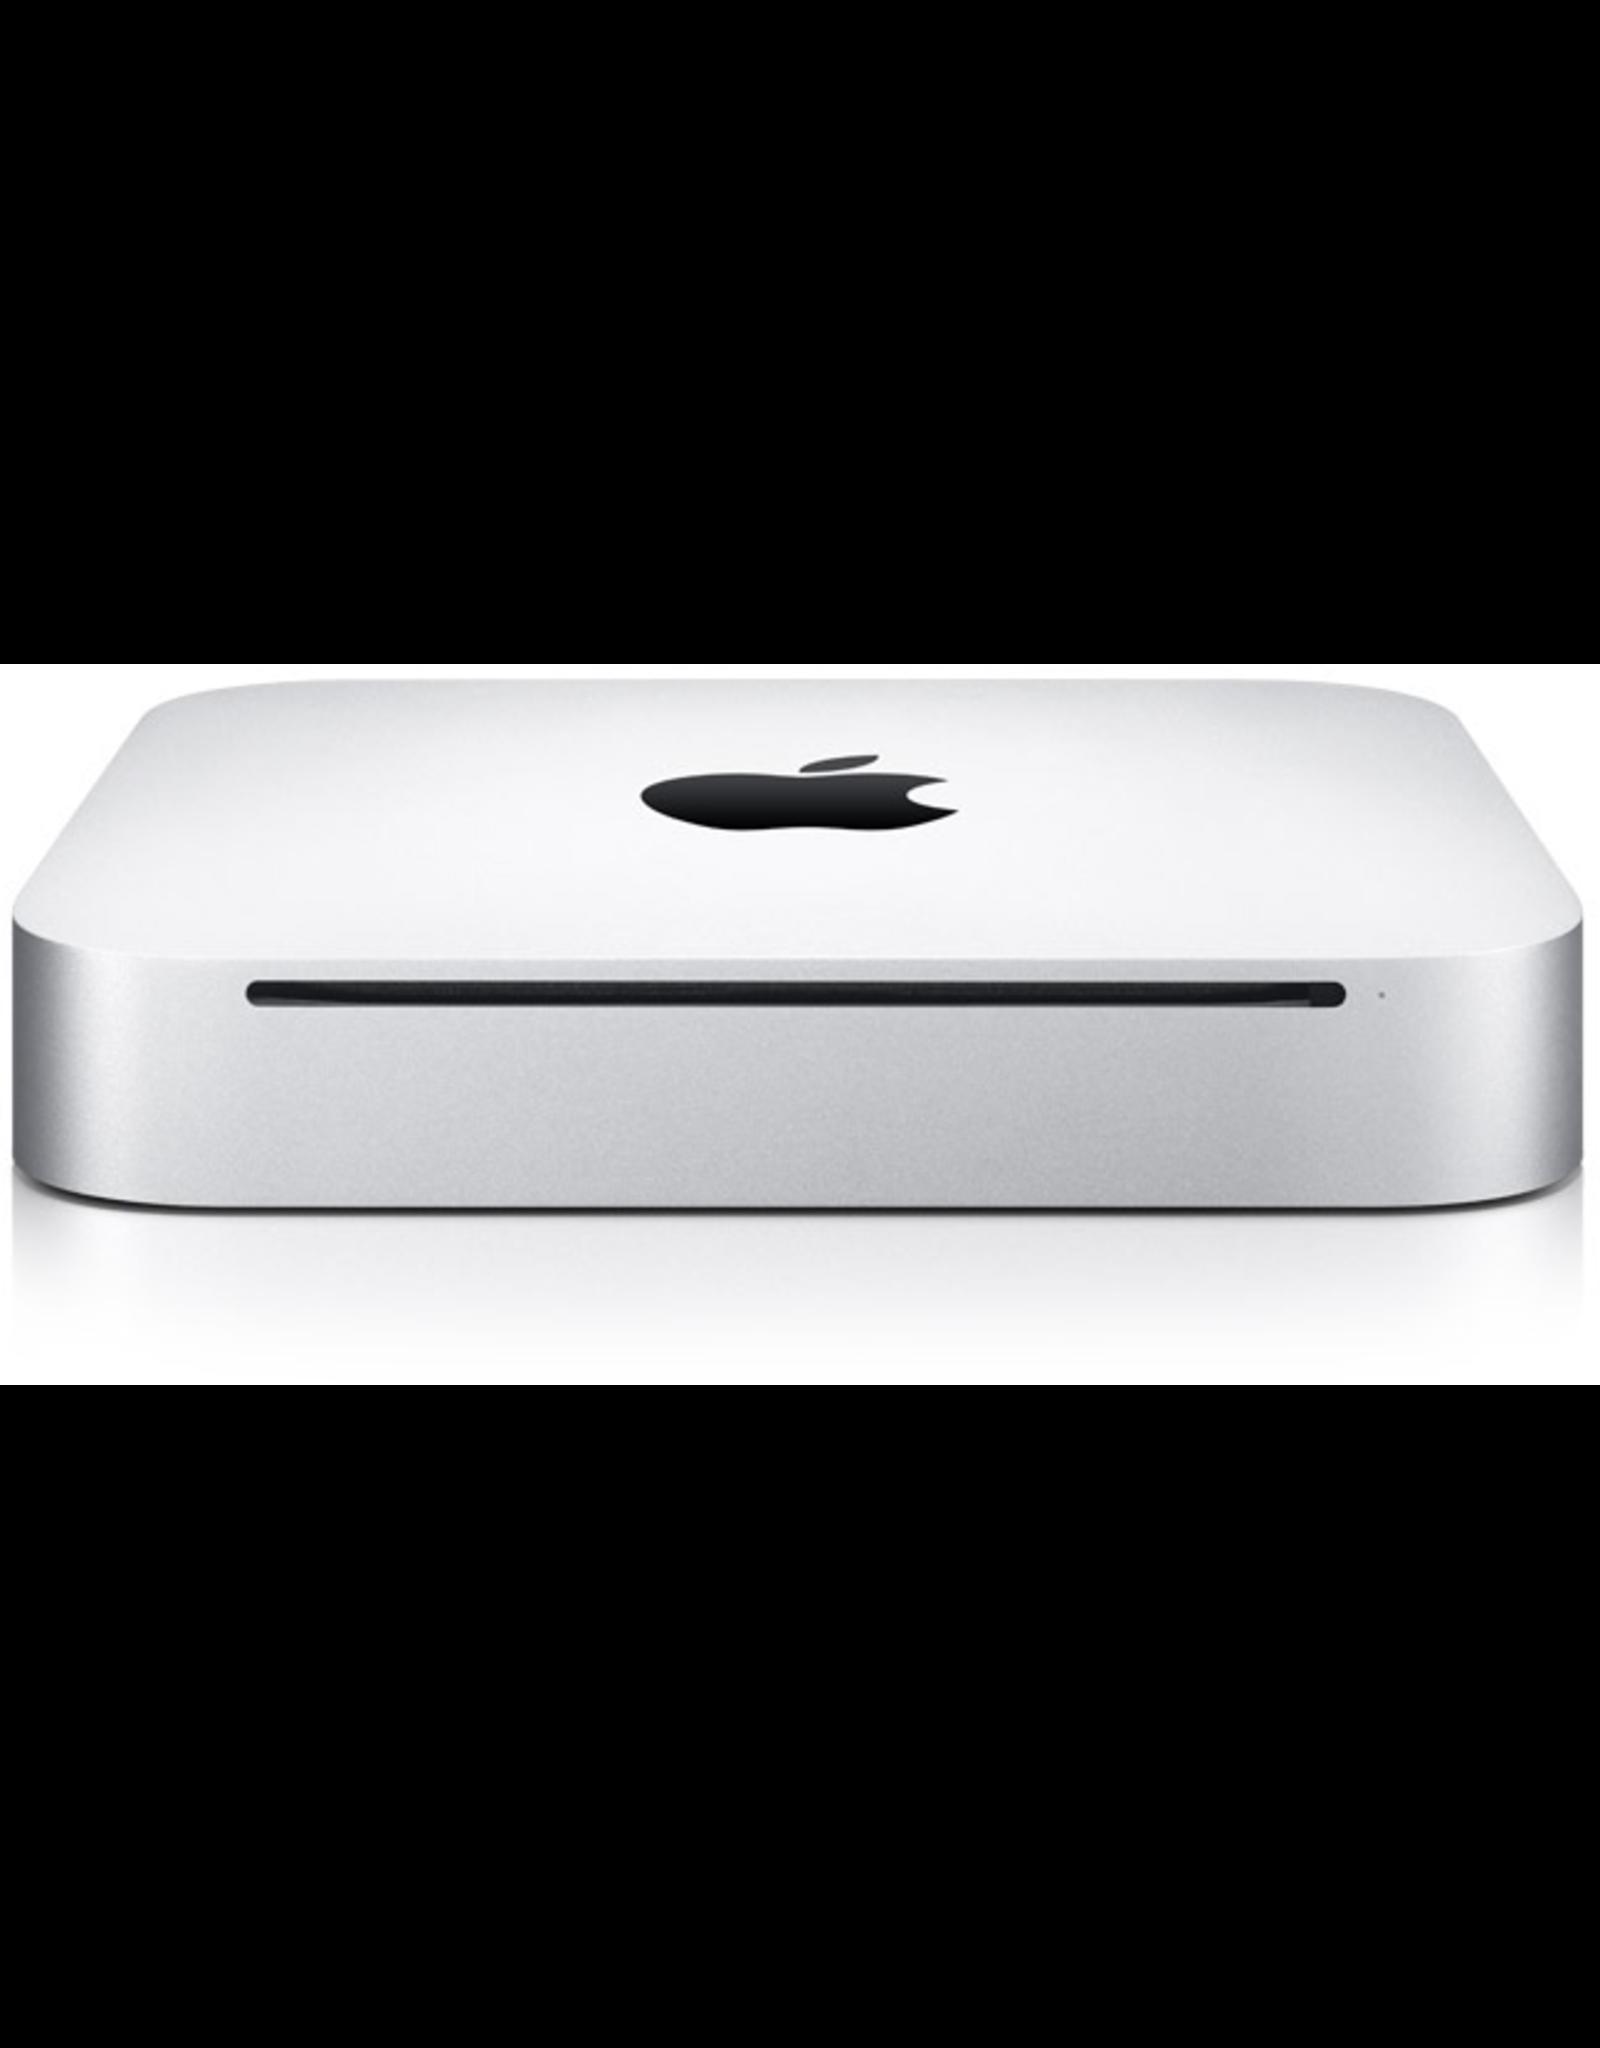 Apple Mac mini (Late 2010) - 2.4 GHz Intel Core 2 Duo / 4 GB / 500 GB HDD - 30 Days Exchange